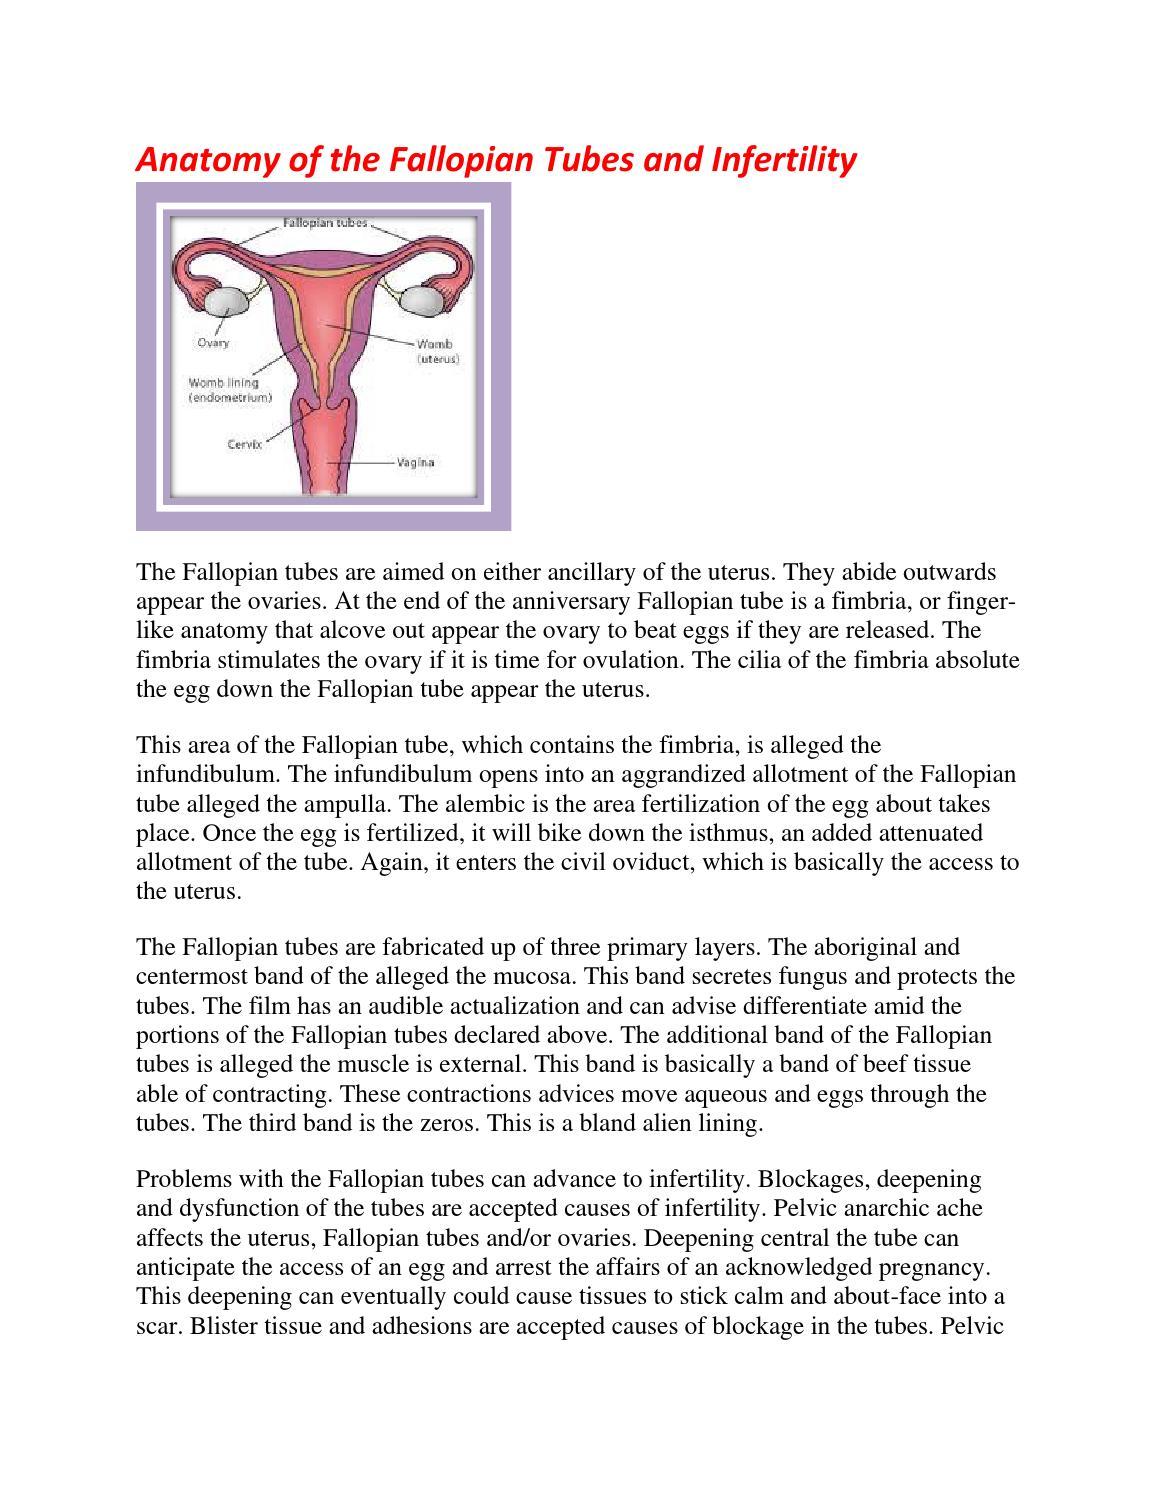 Fallopian tube failure treatment in Bilaspur by Amisha - issuu